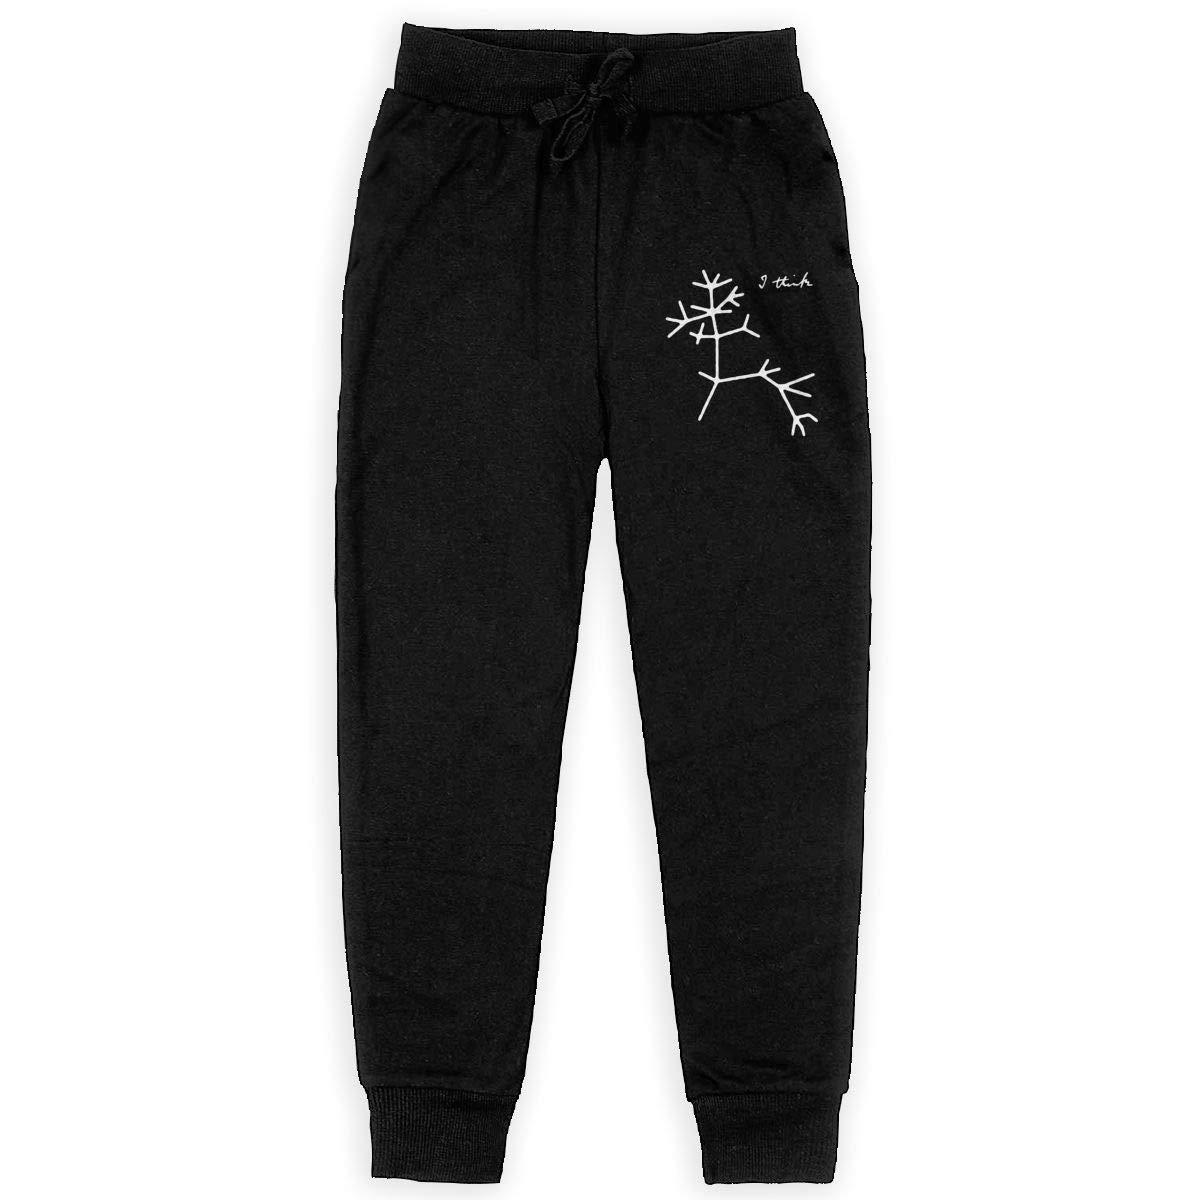 Dunpaiaa Darwin I Think Tree Boys Sweatpants,Joggers Sport Training Pants Trousers Black